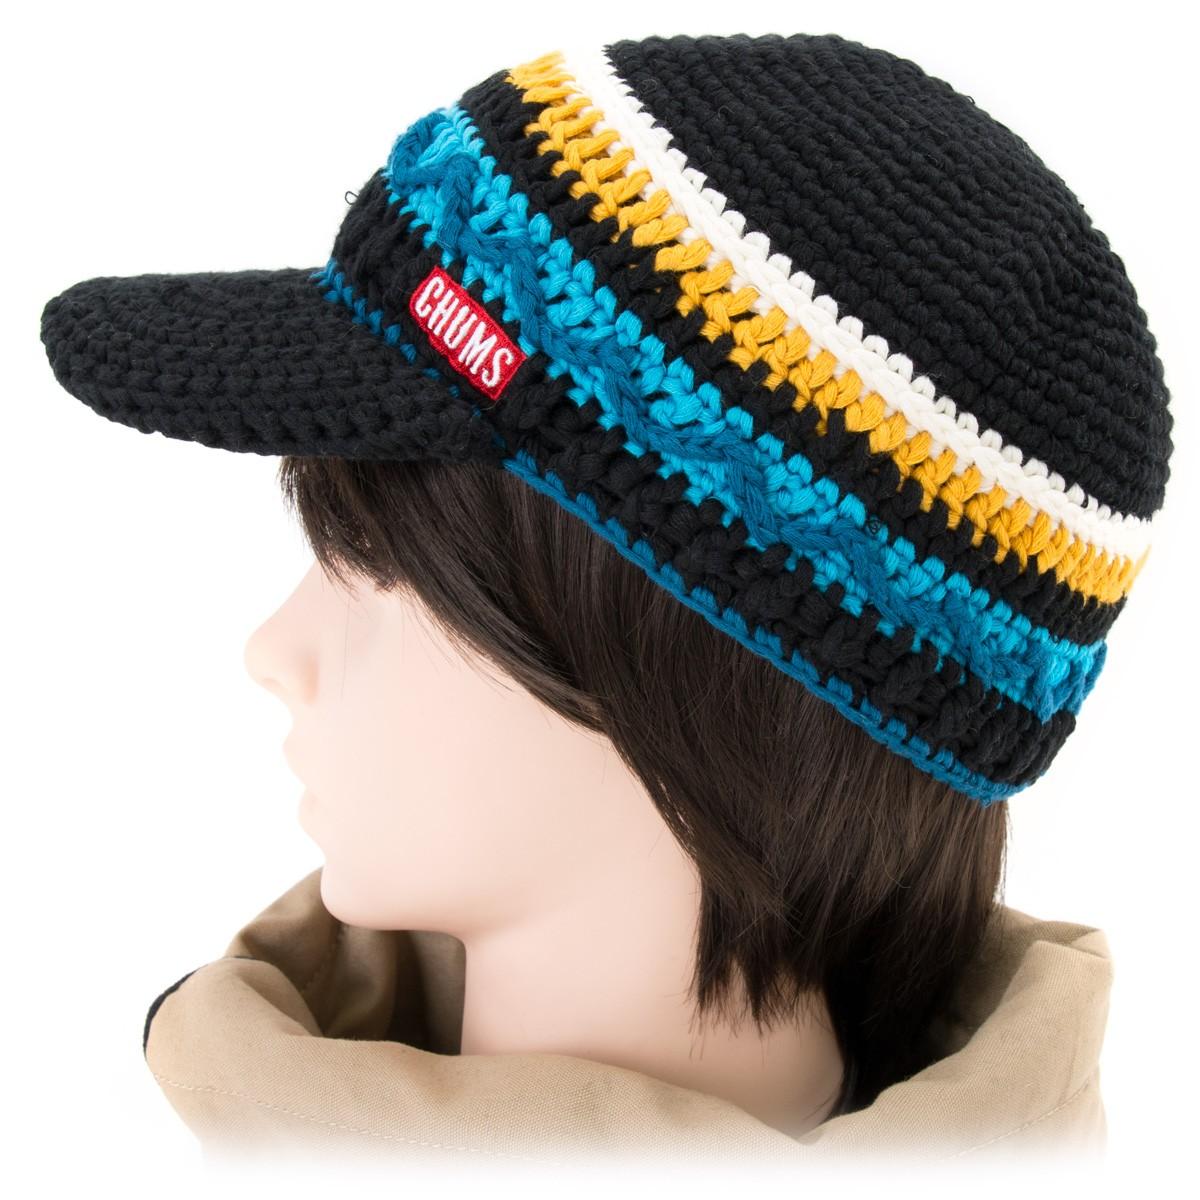 chums border work knit cap